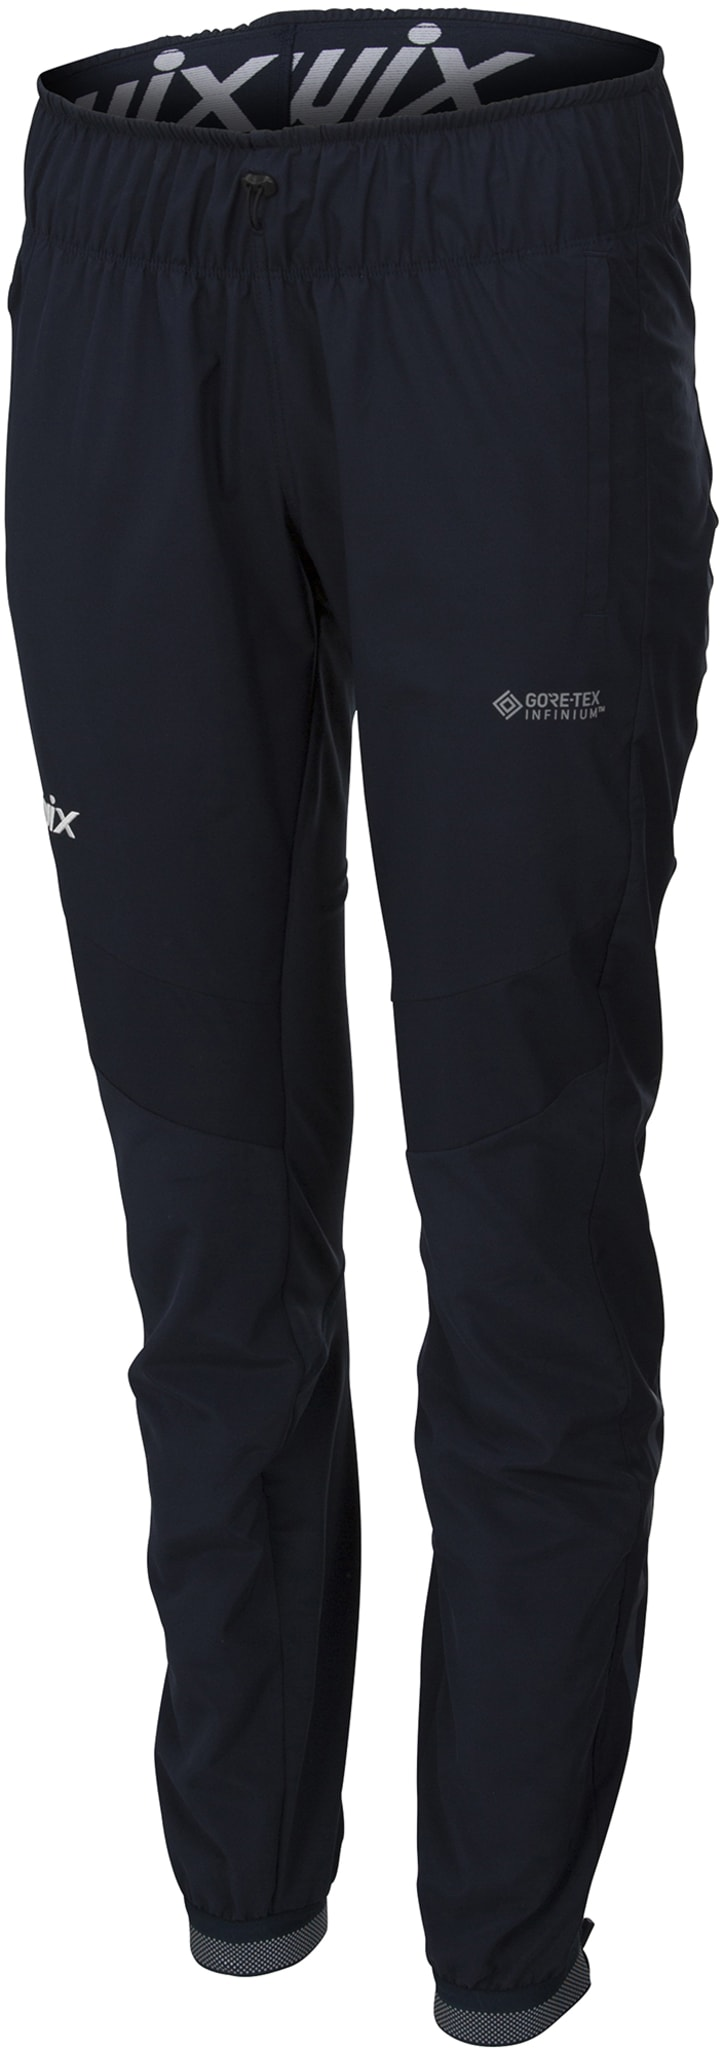 Evolution Gore-Tex Infinium pants W